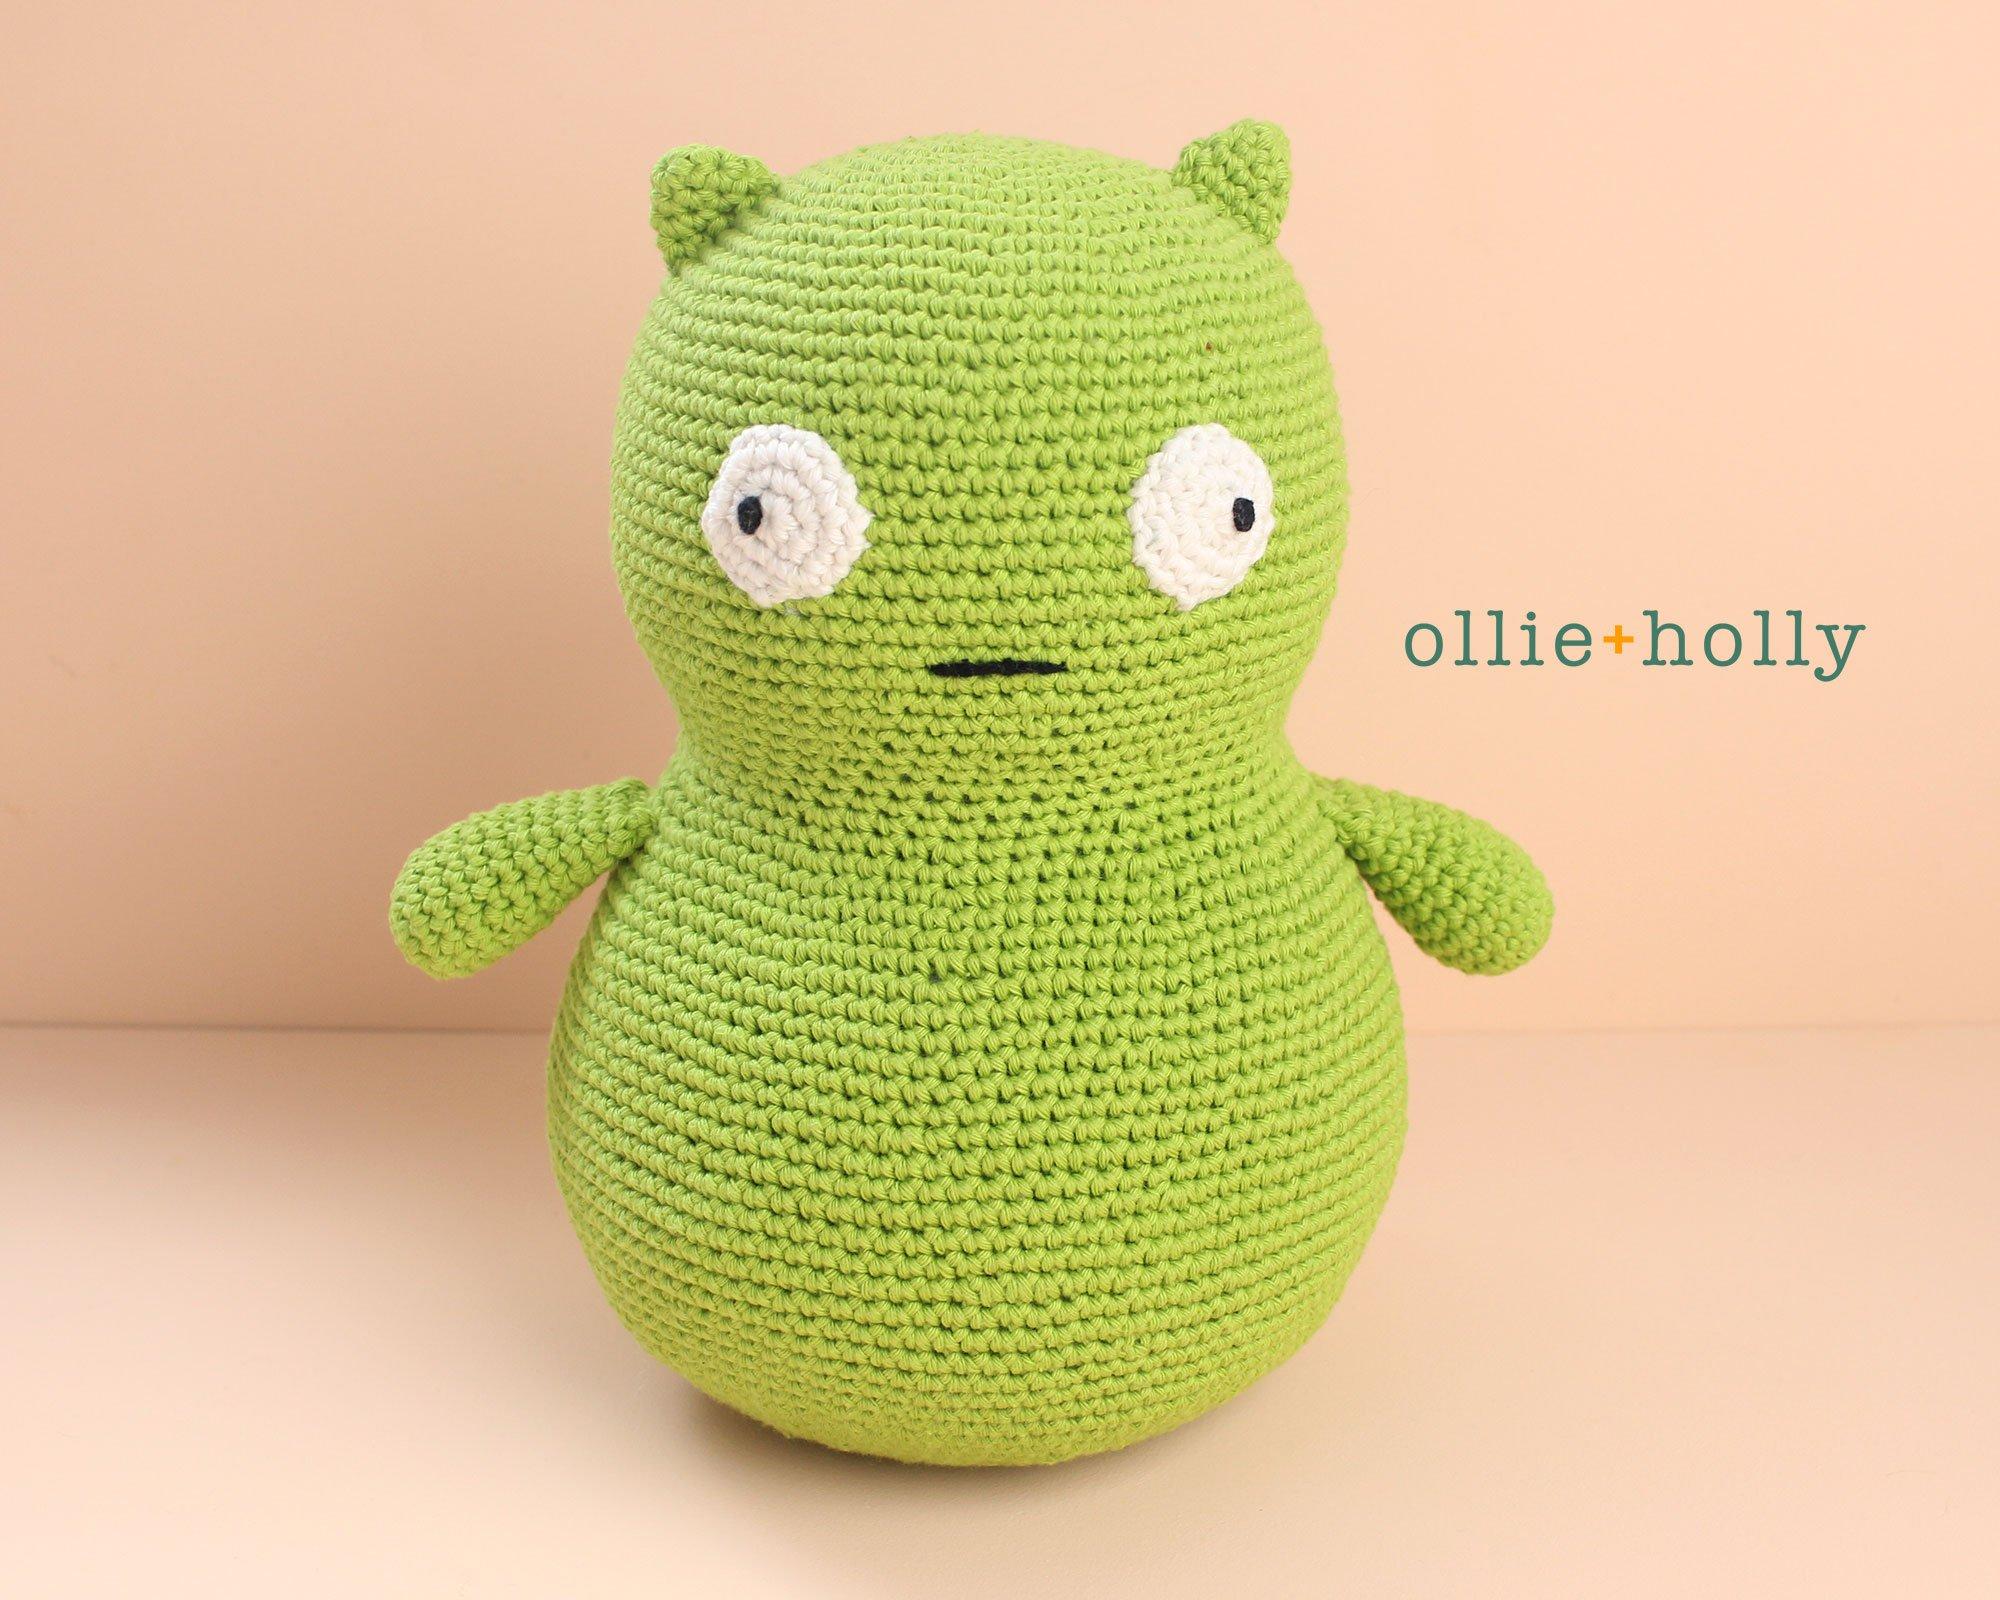 Free Louise Belcher's Stuffed Animal Kuchi Kopi (from Bob's Burgers) Amigurumi Crochet Pattern Step 11